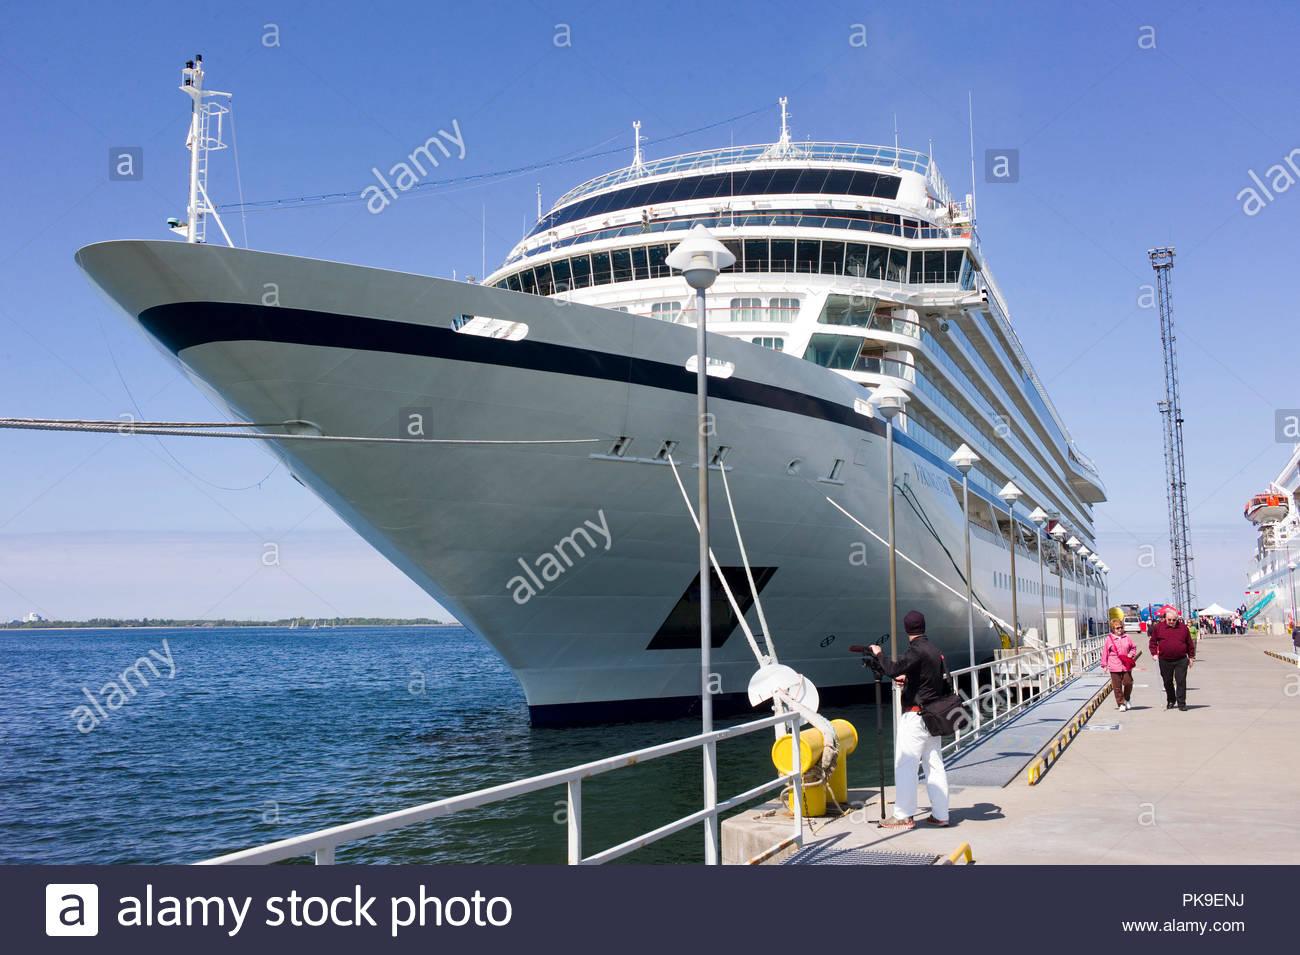 Luxury cruise ship 'Viking Star', part of the Viking ocean going fleet, moored in Tallin harbour, Estonia. Stock Photo